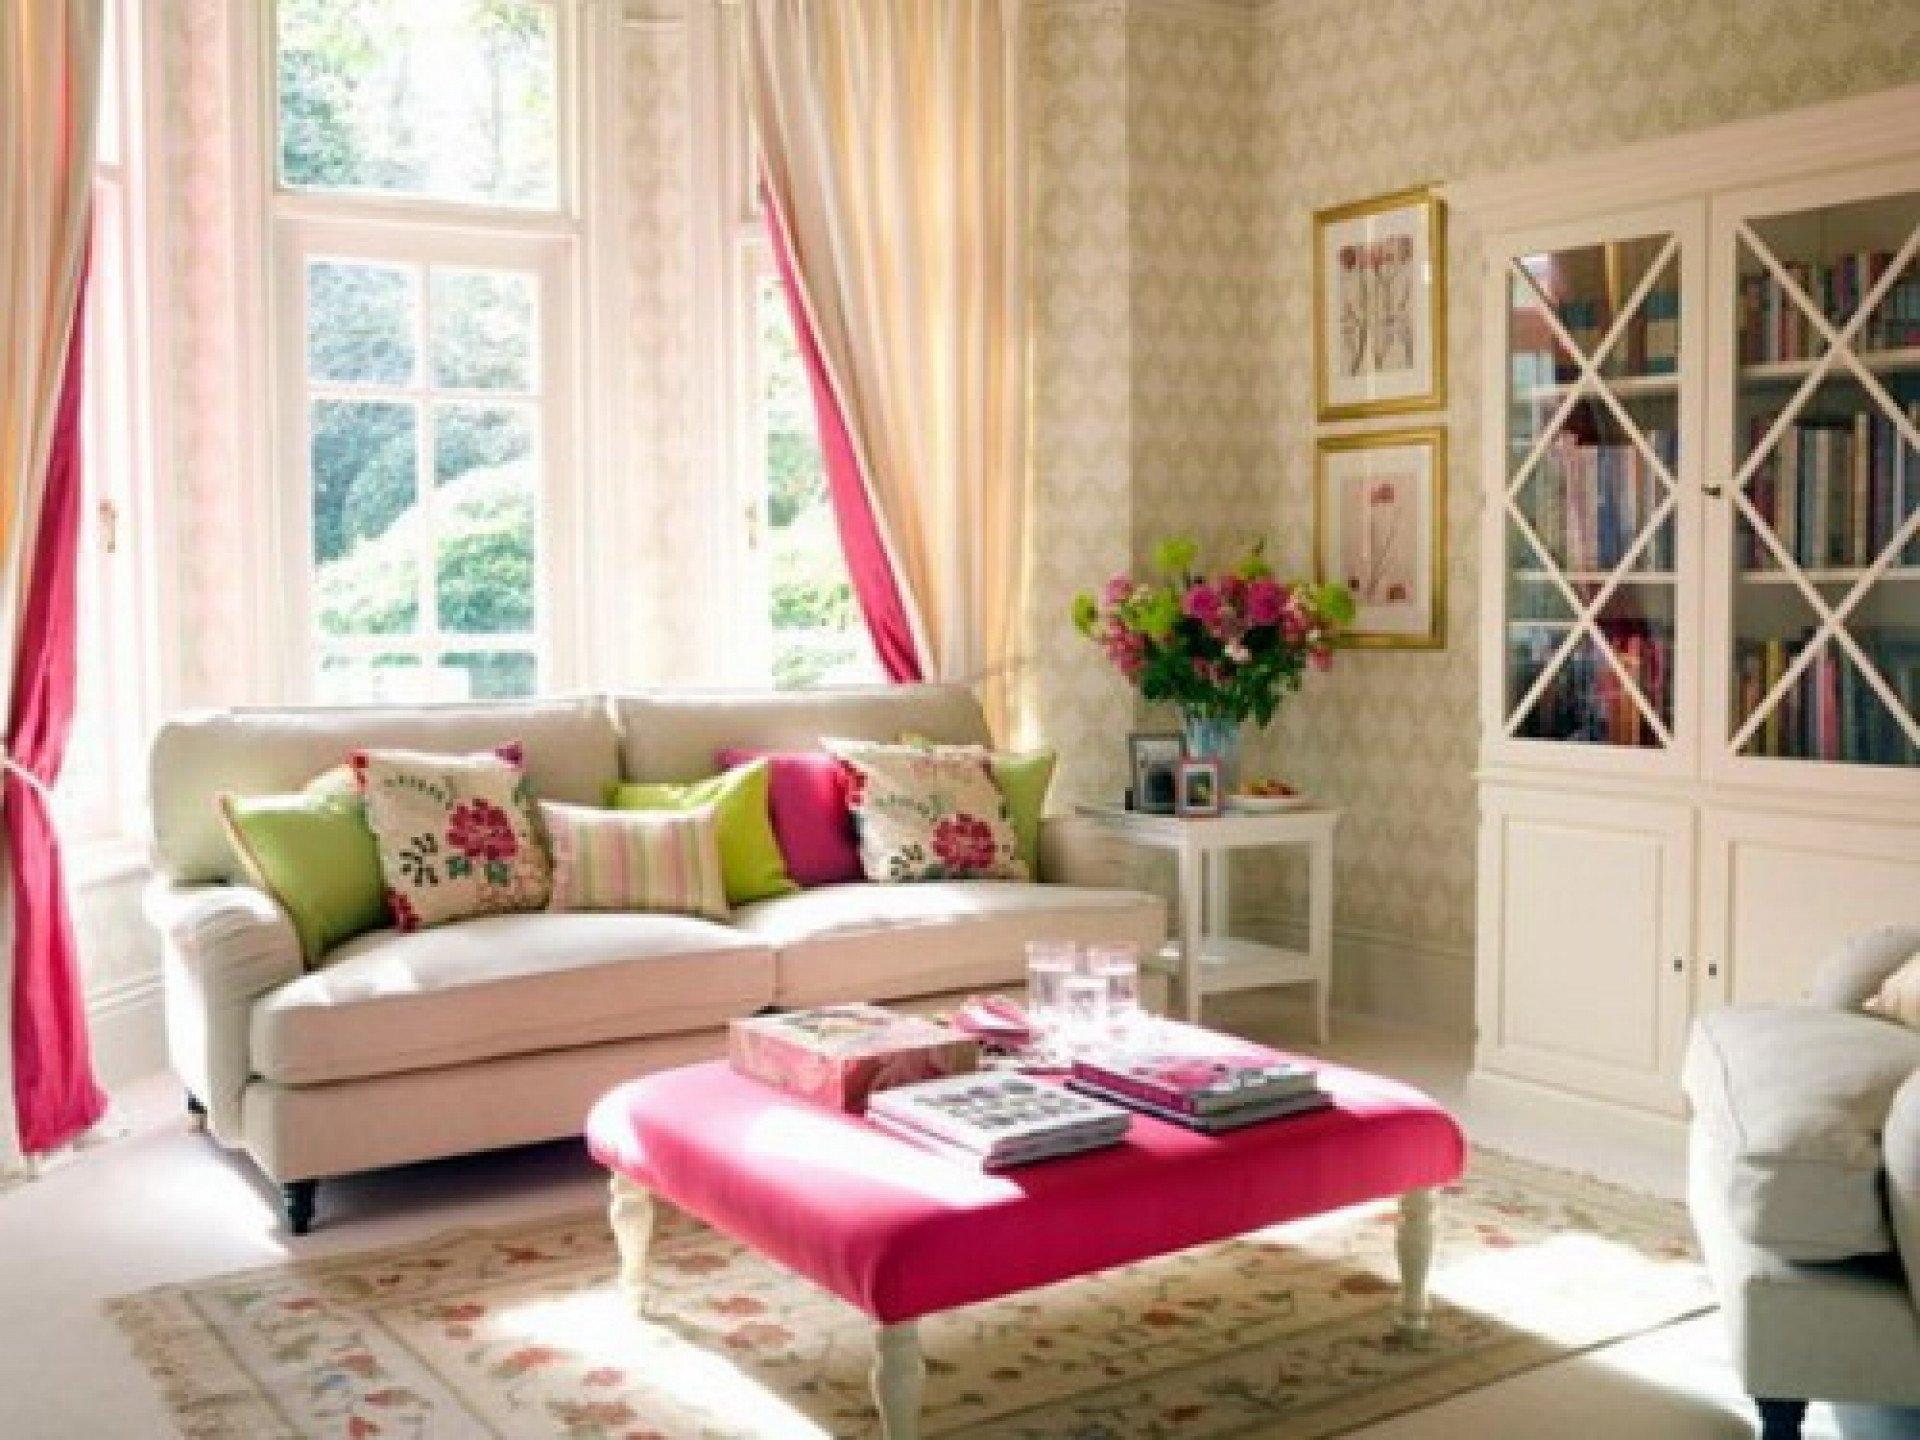 Comfortable Feminine Living Room New Romantic Living Room Ideas for Feminine Young La S' Casa Ideas 4 Homes